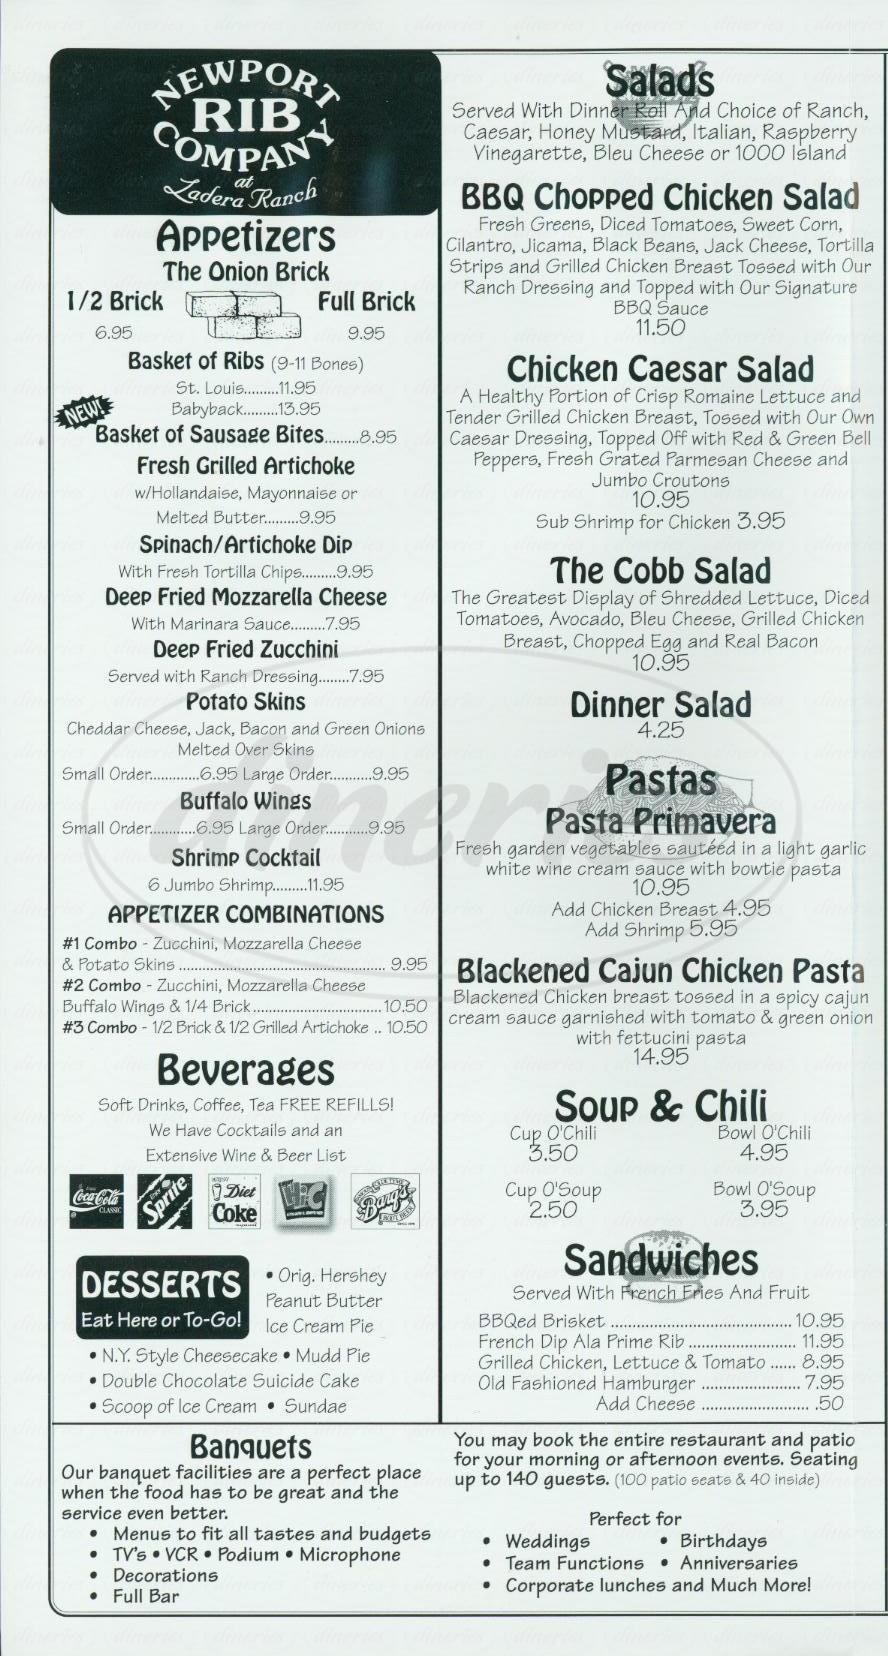 menu for Newport Rib Company